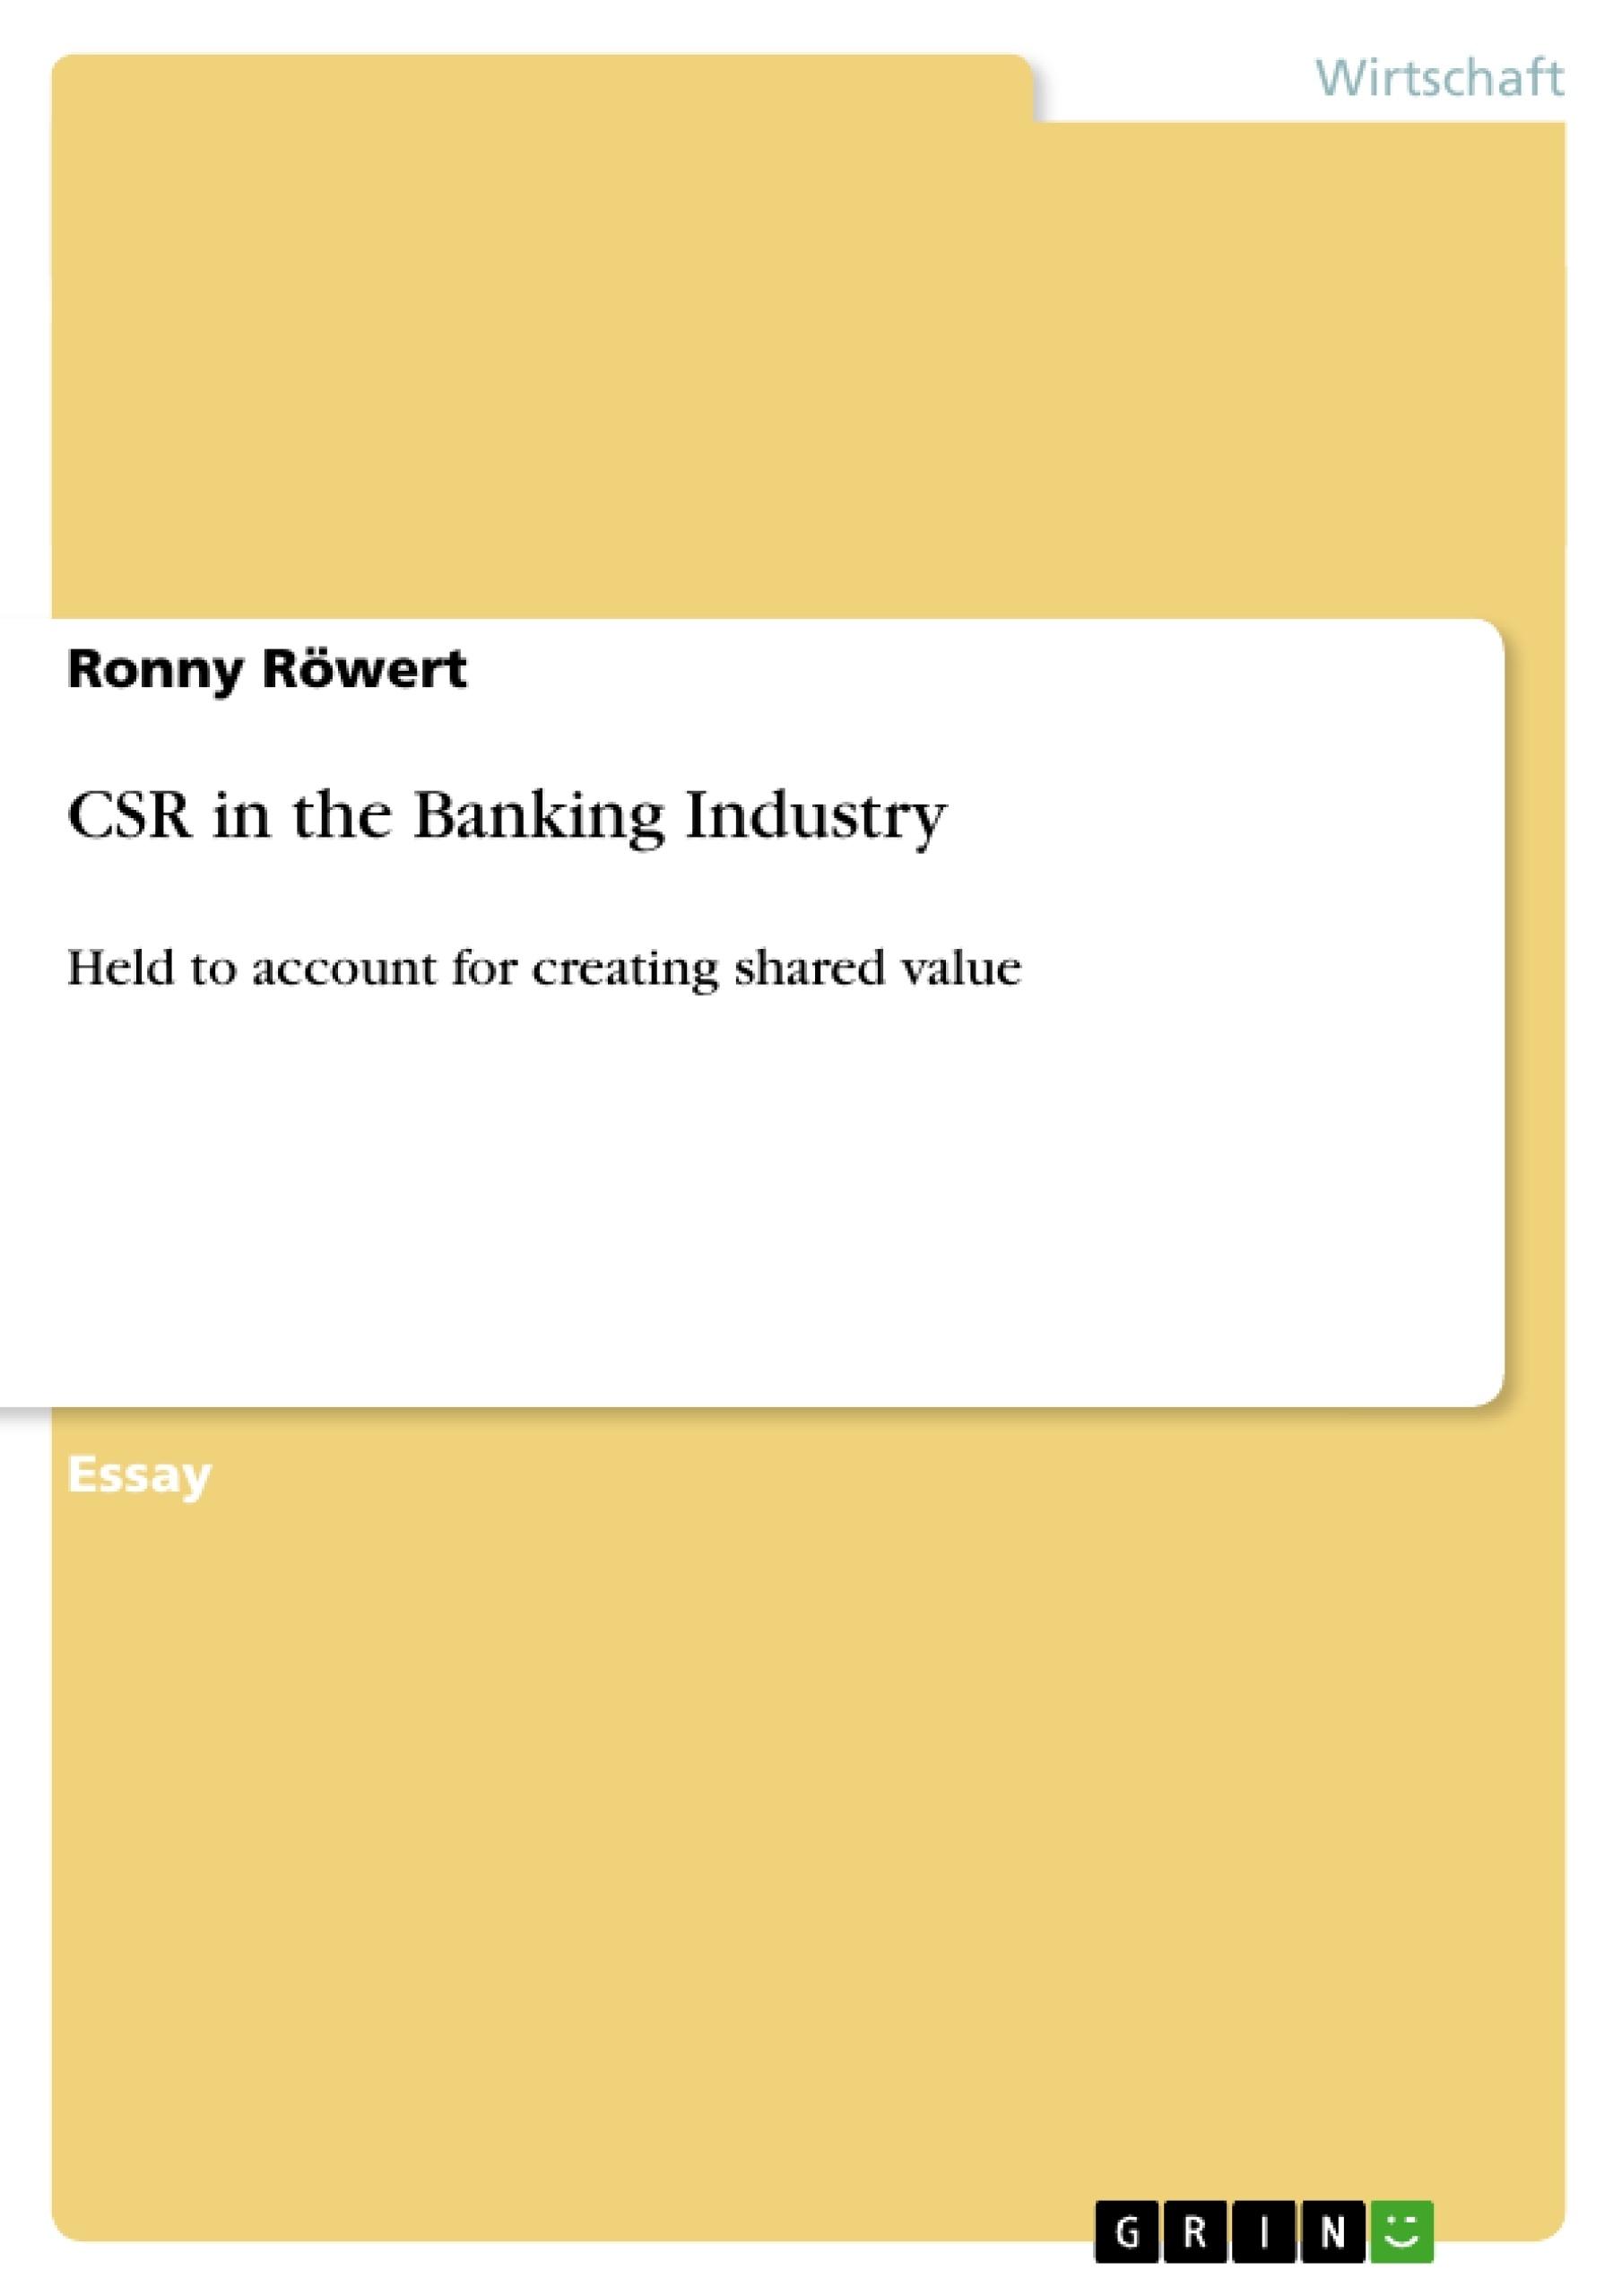 Titel: CSR in the Banking Industry